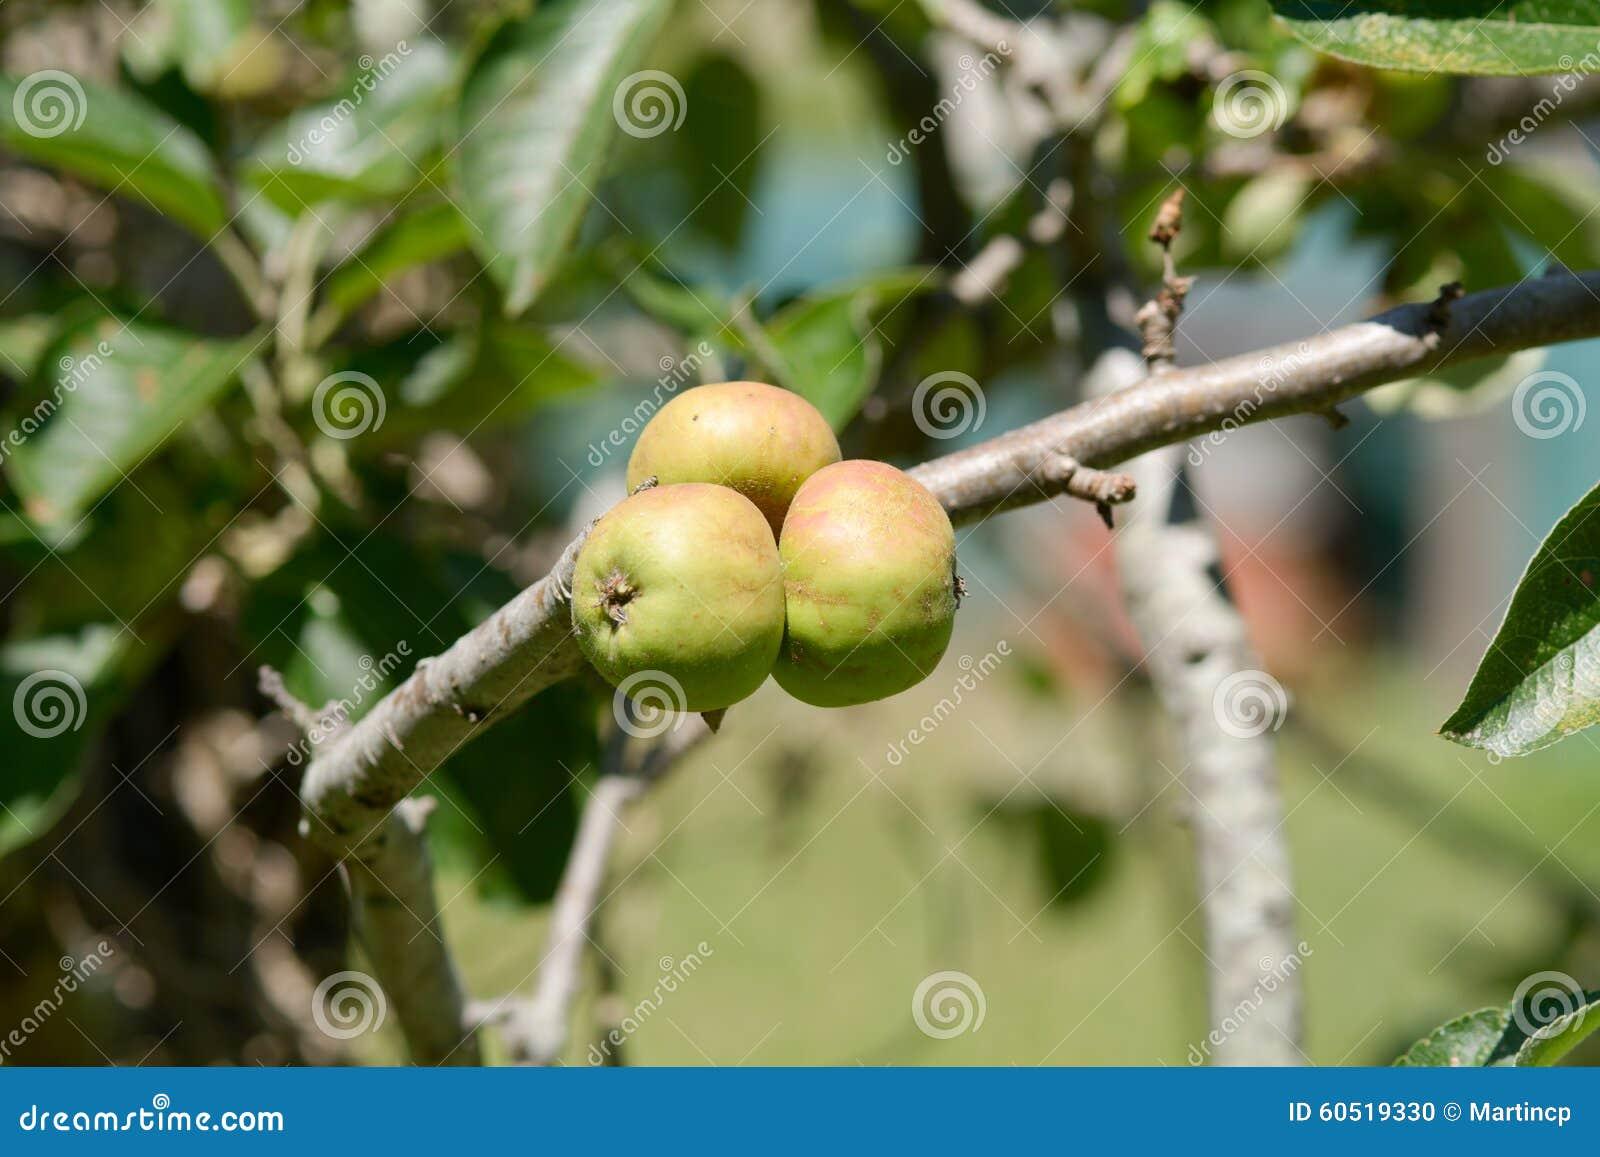 Three small apples growing on tree